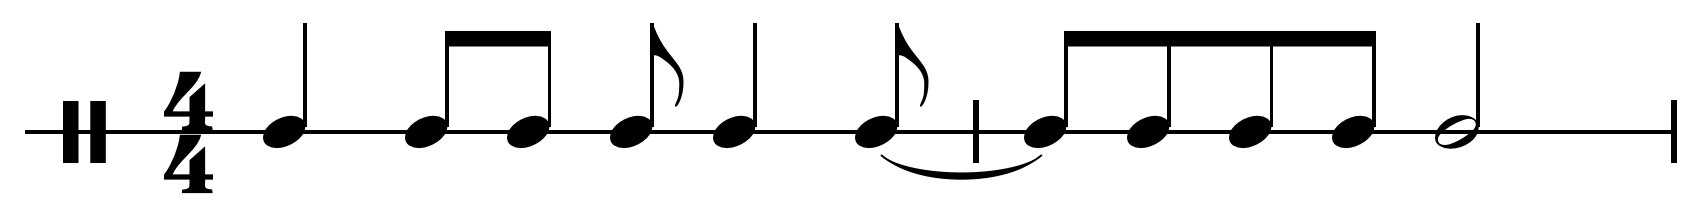 File:Salsa dance pattern.png - Wikimedia Commons